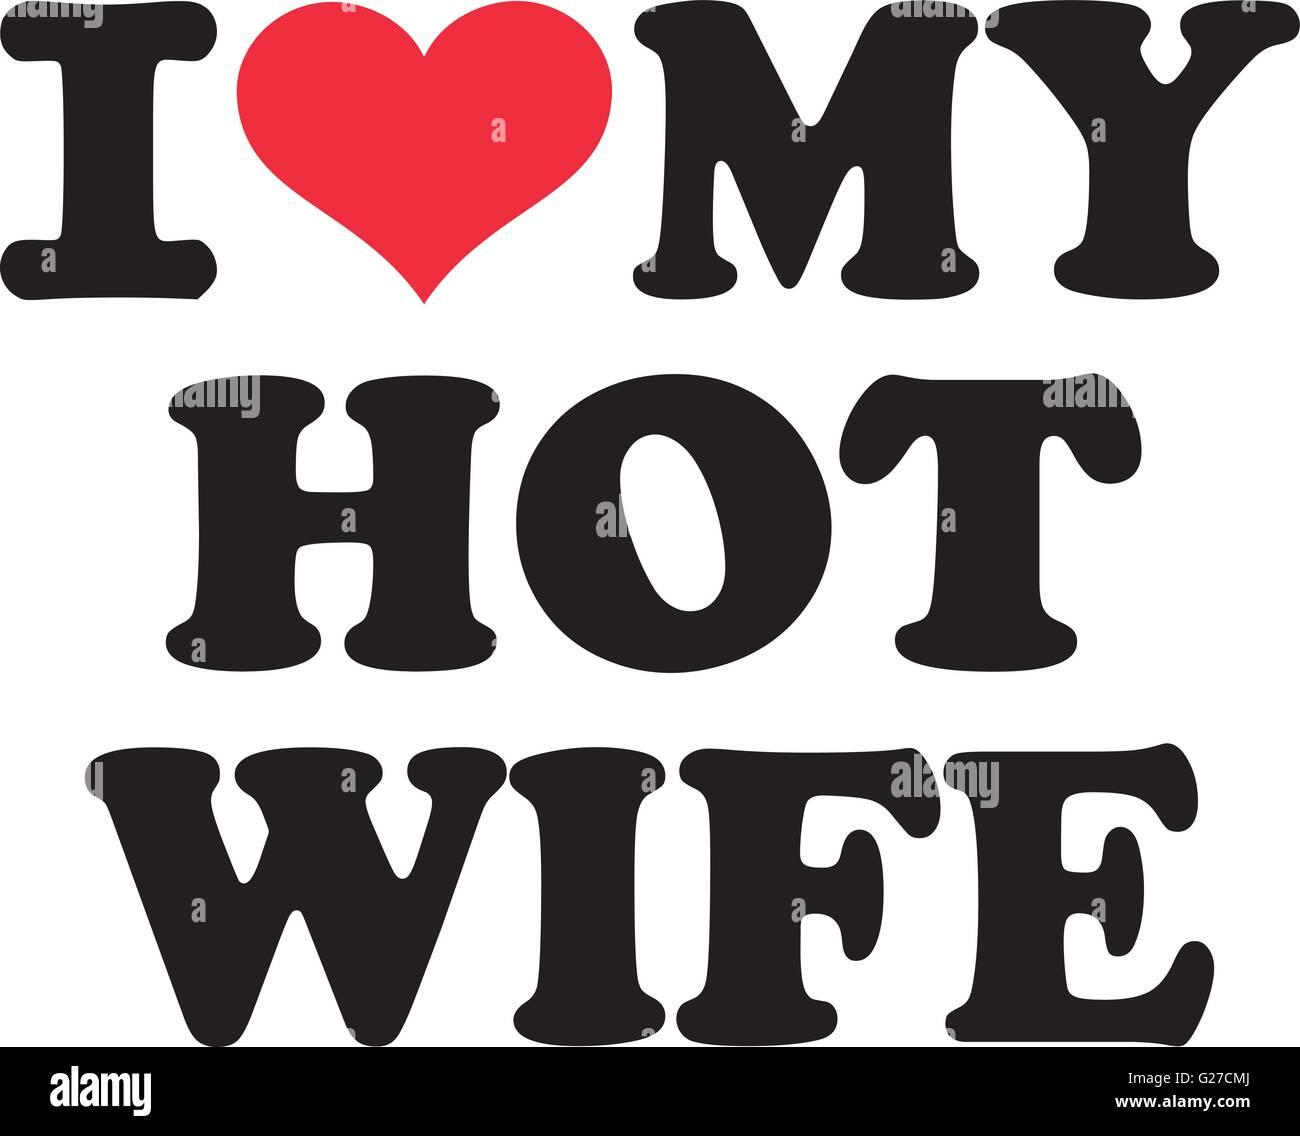 Www my hot wife com